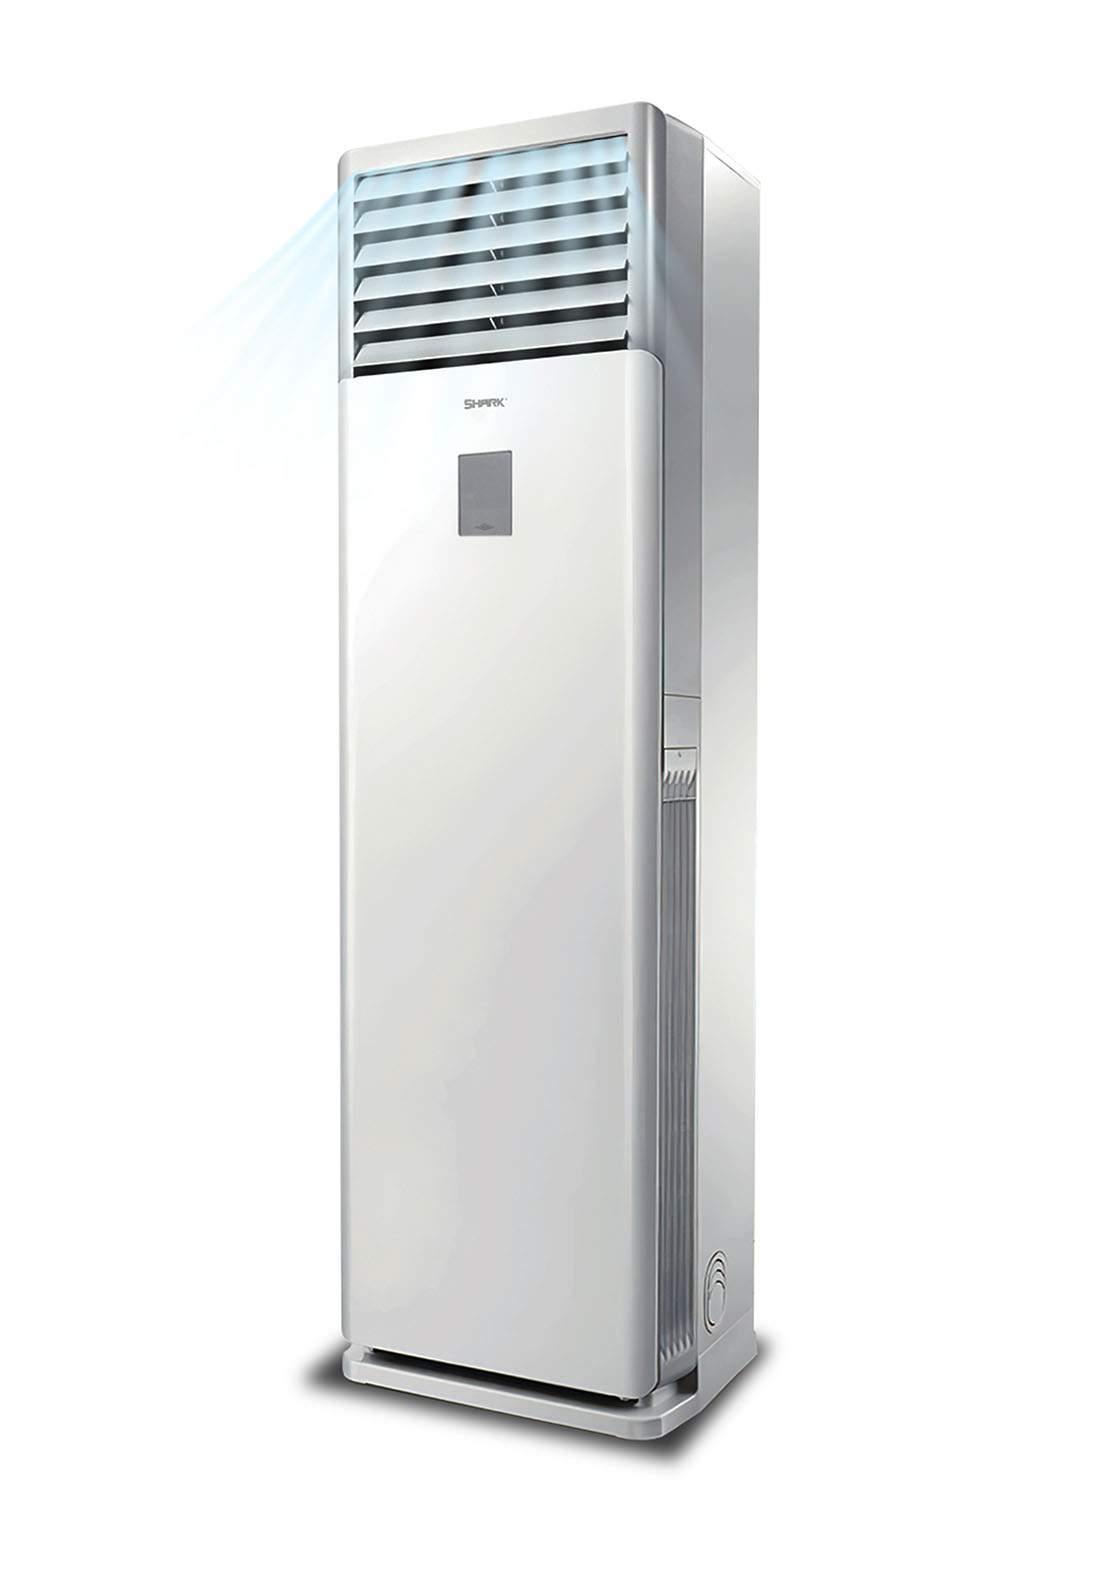 Shark Split Vertical Air Conditioner 3 Ton Double Fan - سبلت عمودي 3 طن